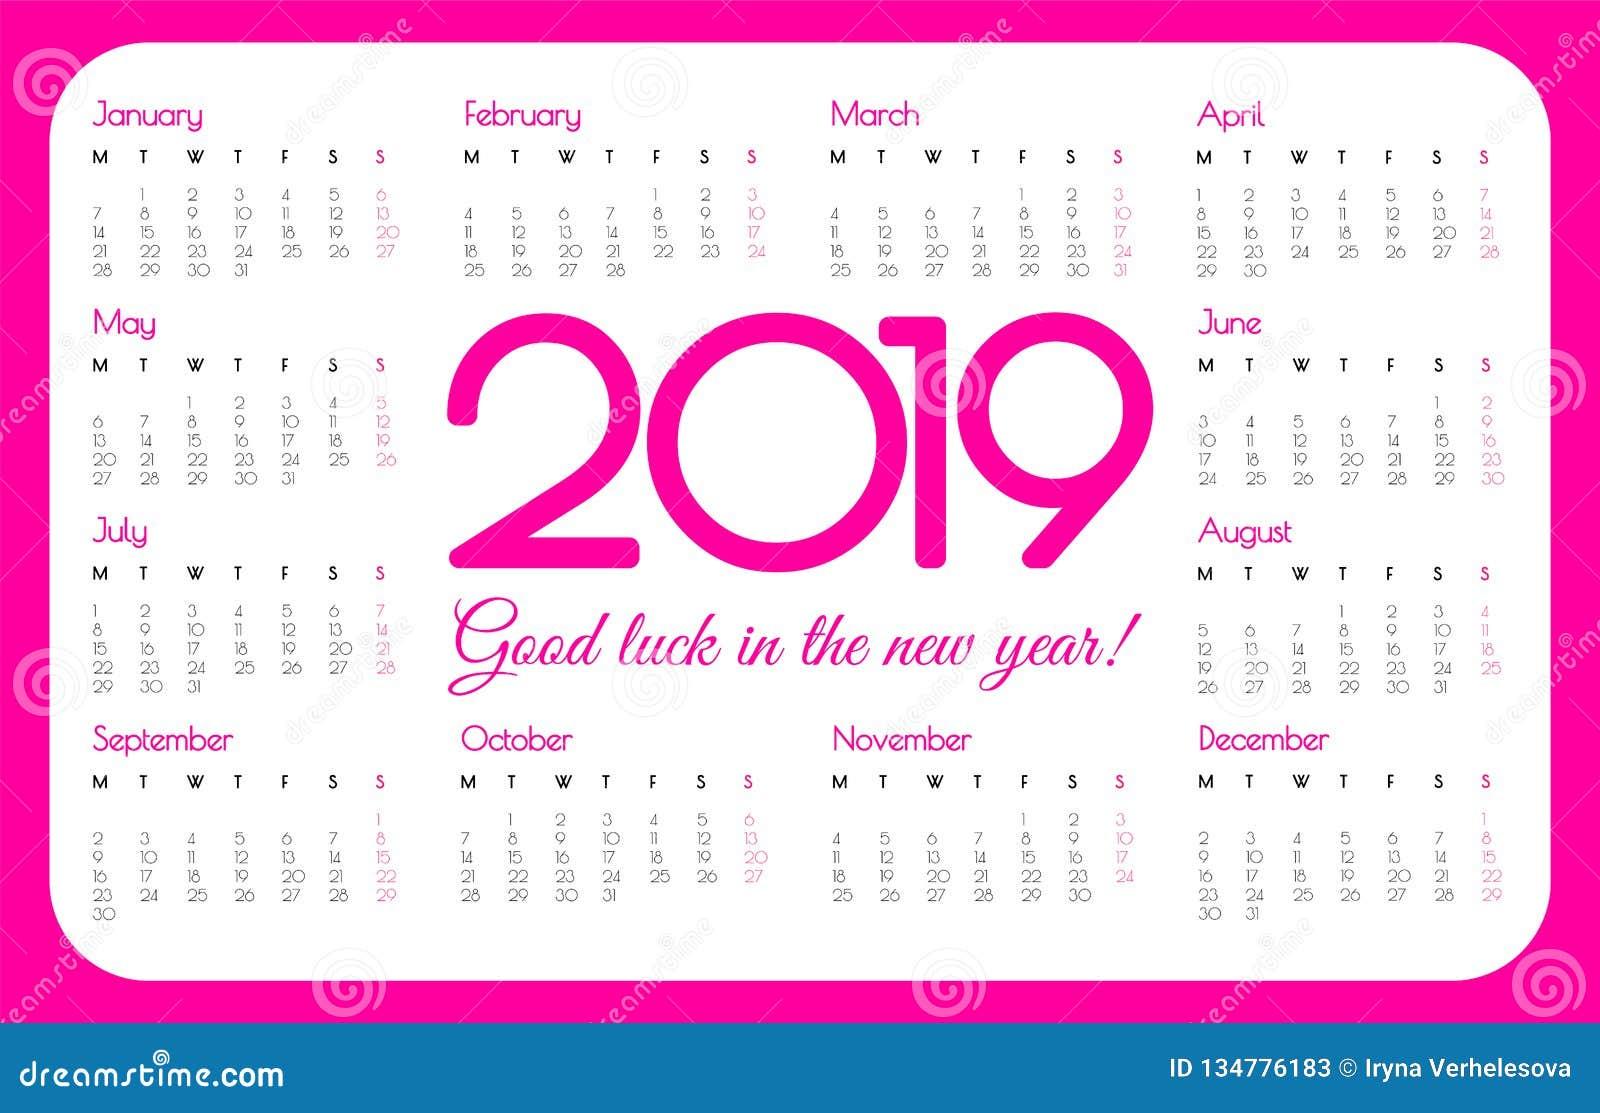 Calendrier De Poche 2019.Calendrier De Poche De 2019 Ans Couleur Rose Conception